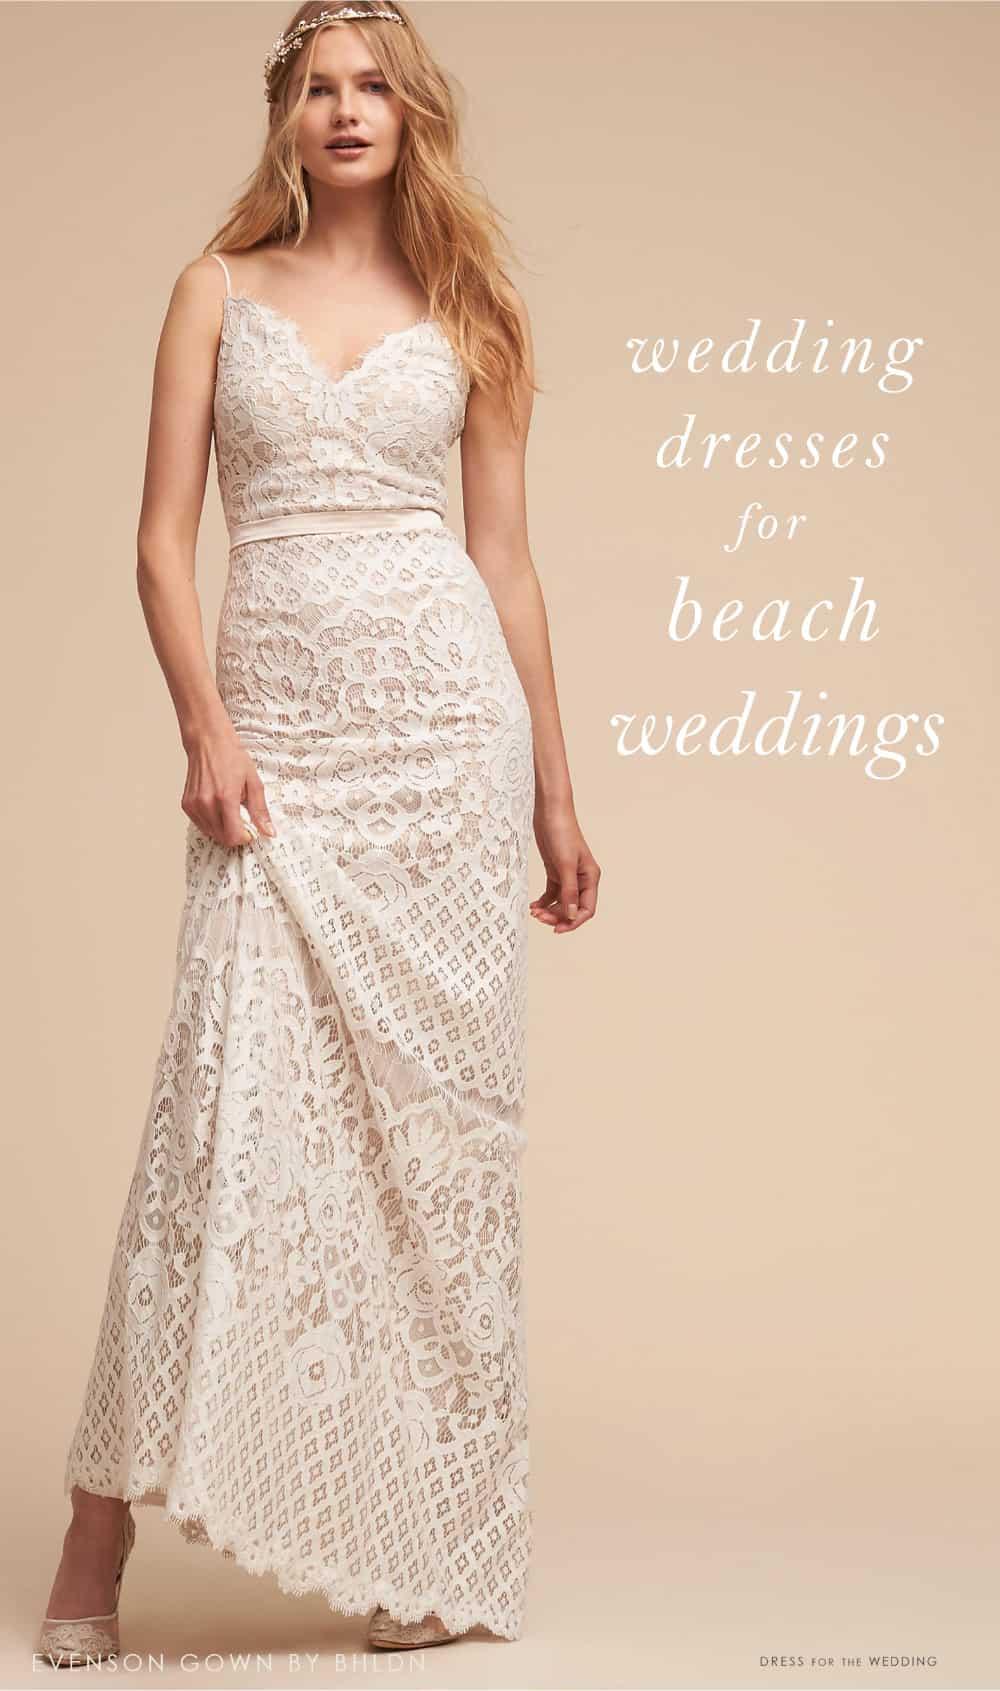 wedding dresses for beach weddings photo - 1